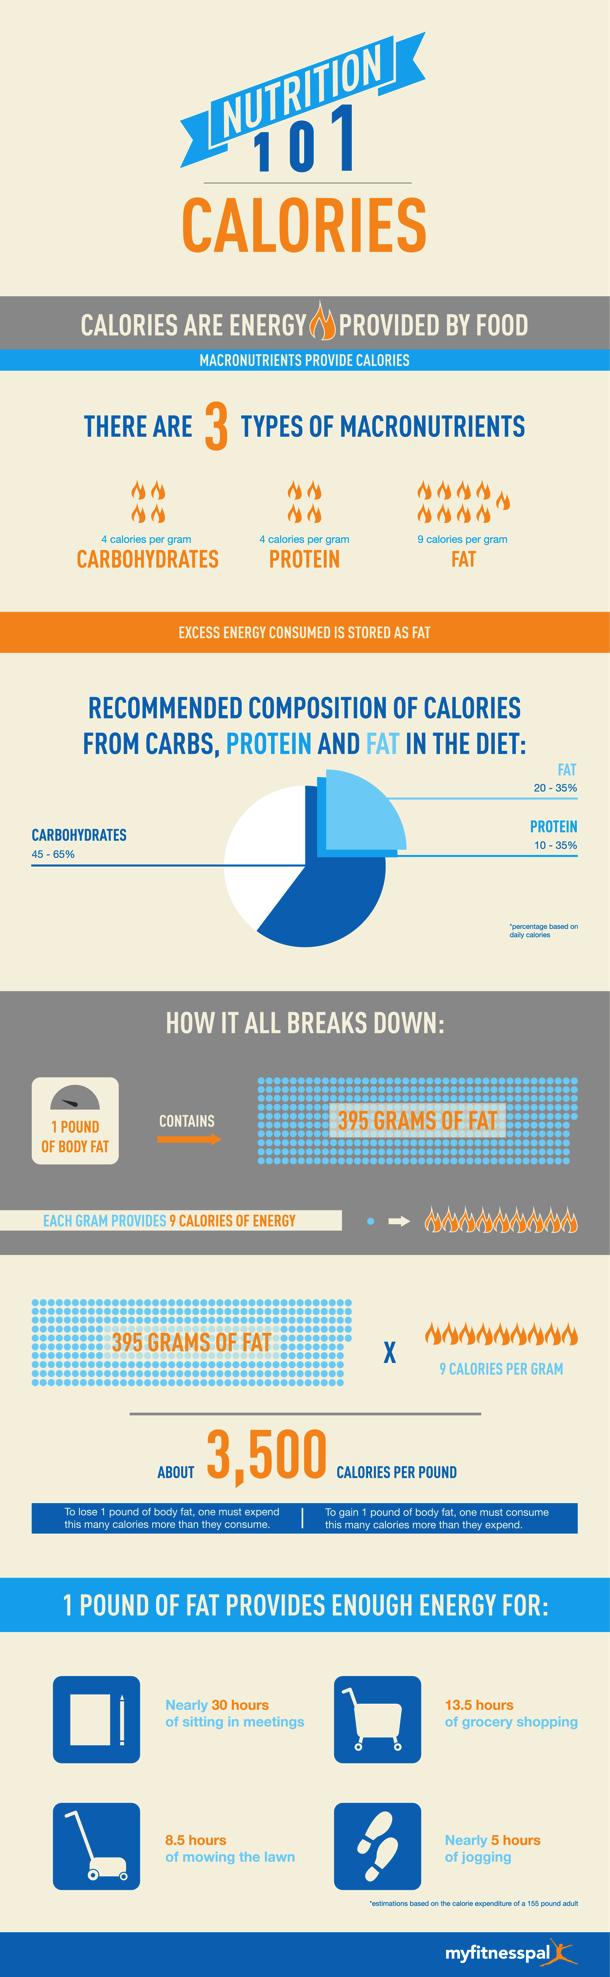 Nutrition 101: Calories [infographic]